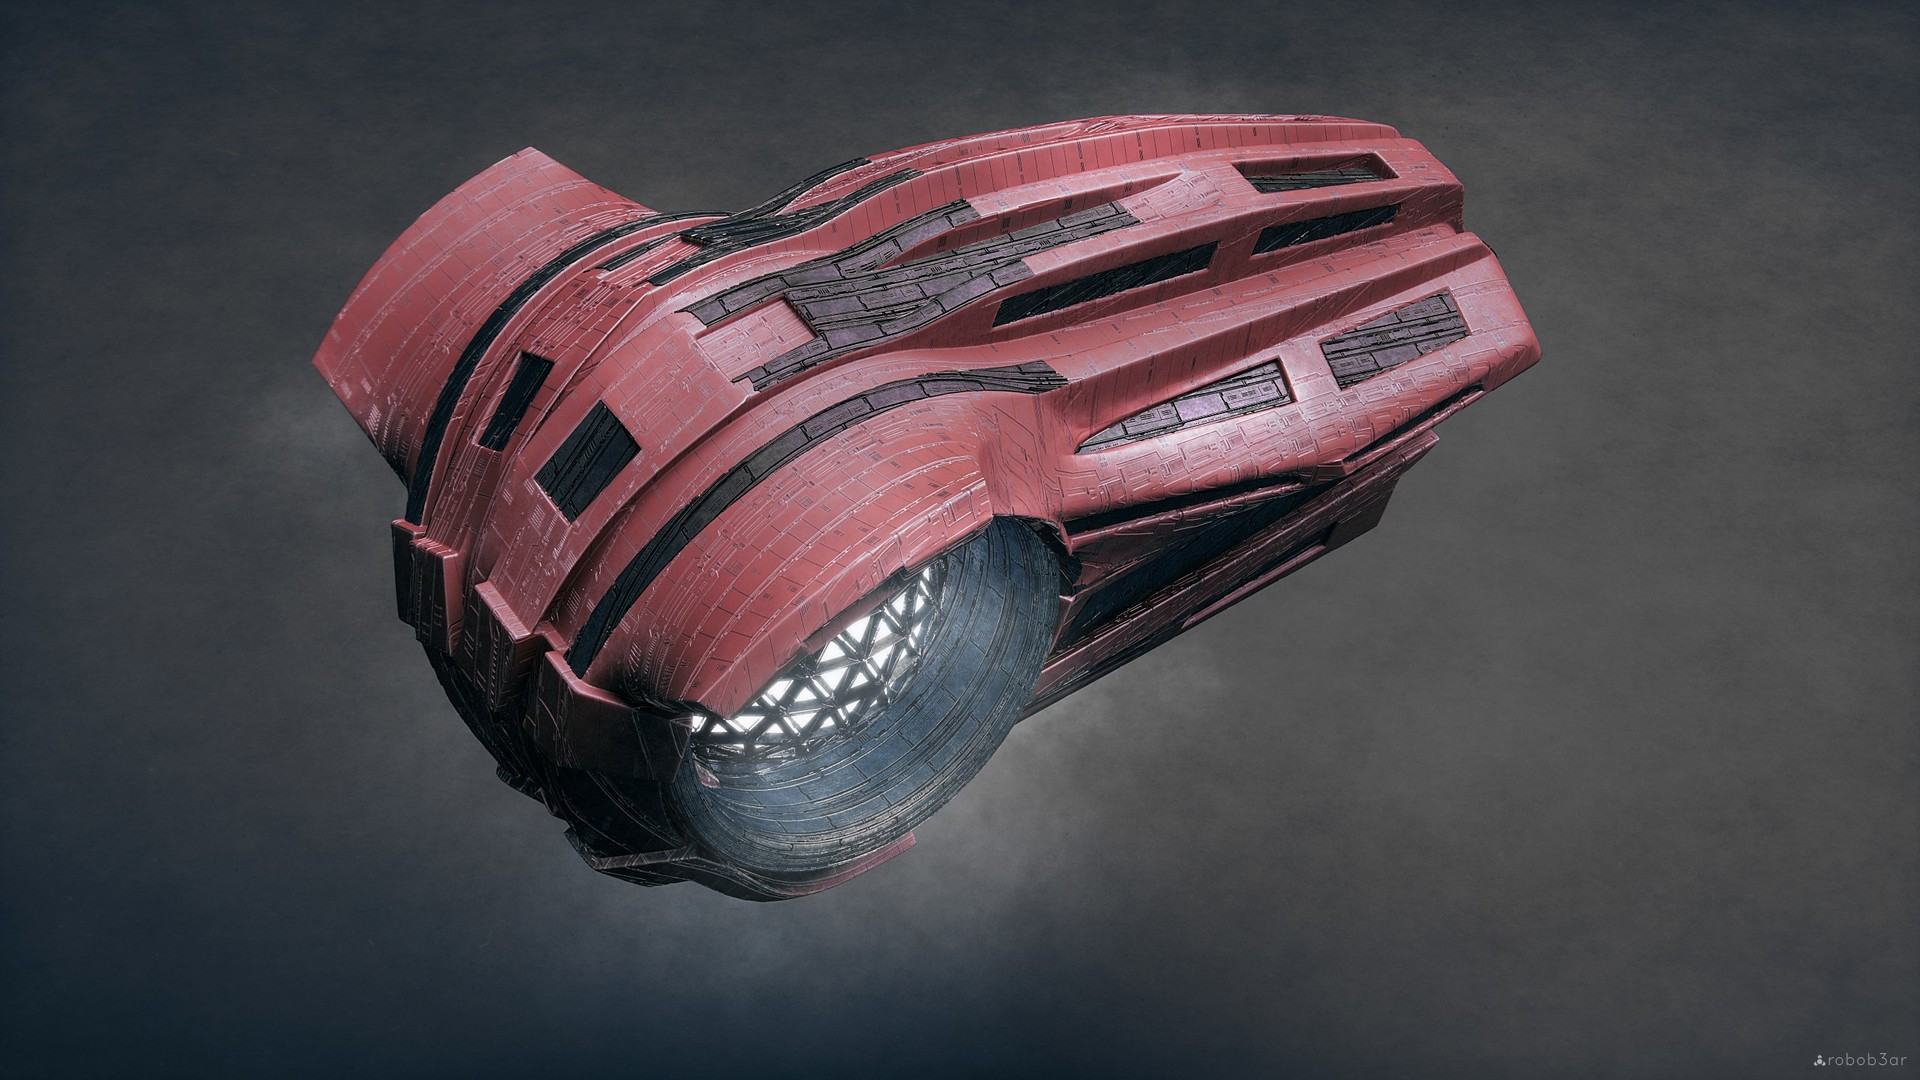 Kresimir jelusic robob3ar 463 190117 ship red ps custom